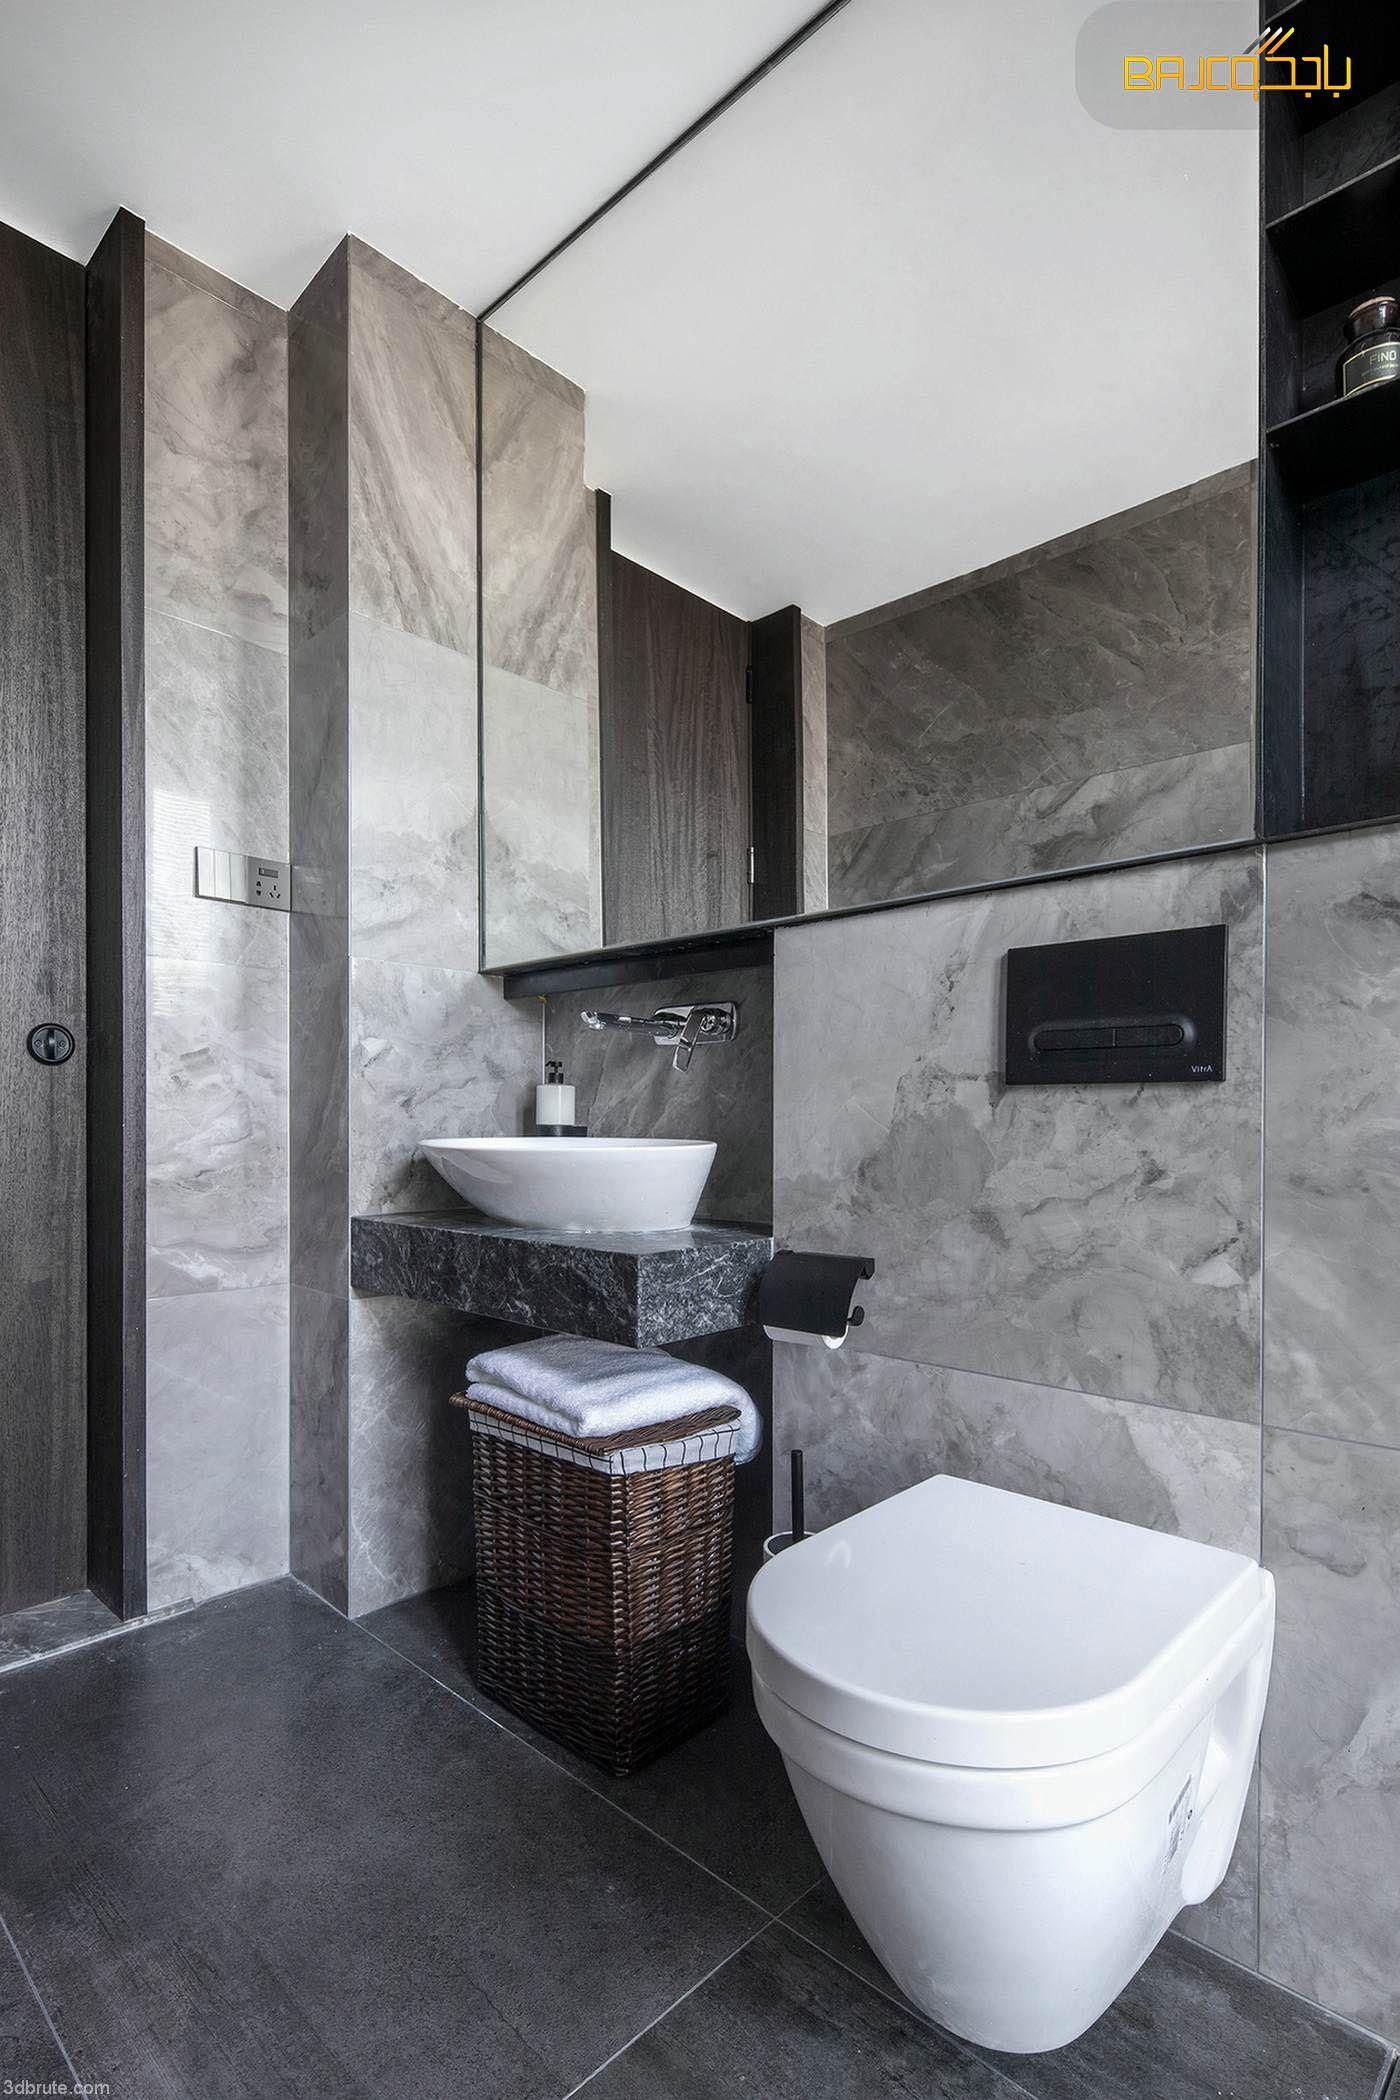 مغسلة رخام Bathroom Marble Toilet